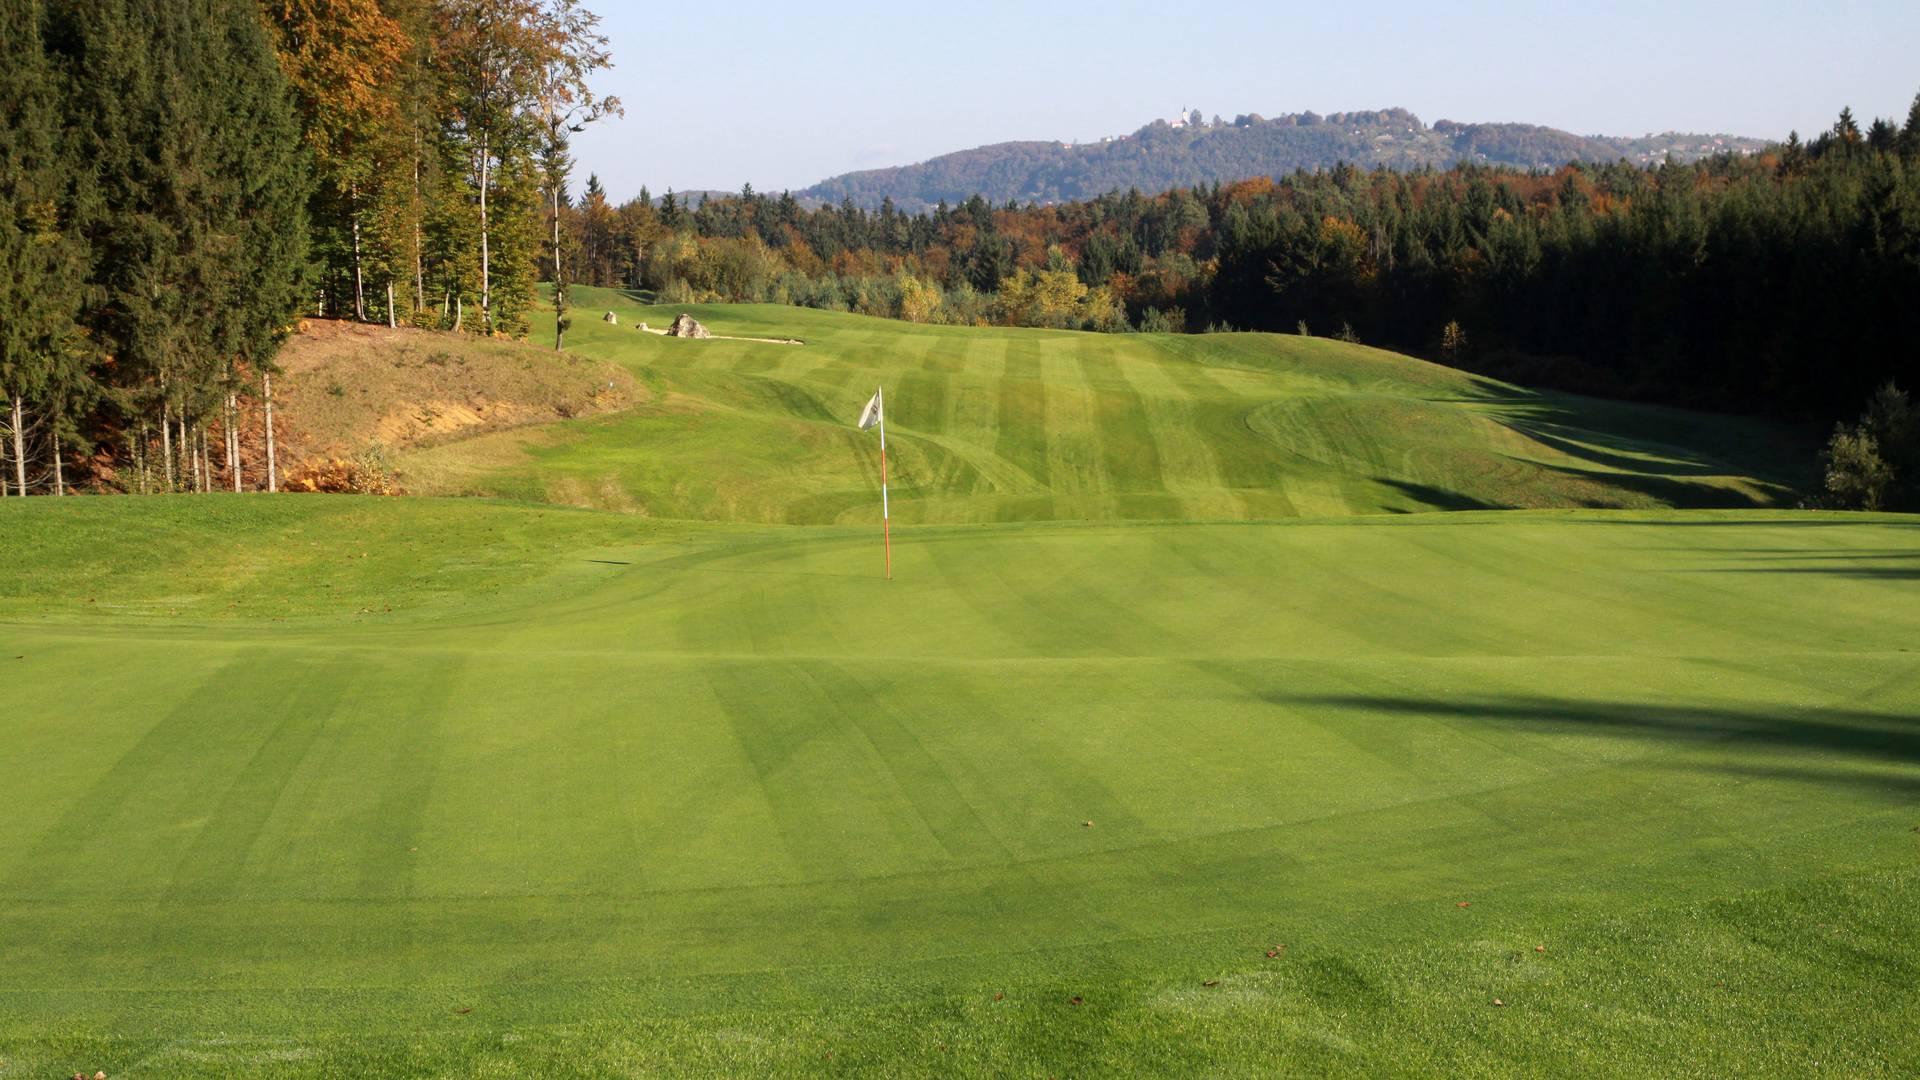 Golf Grad Otočec